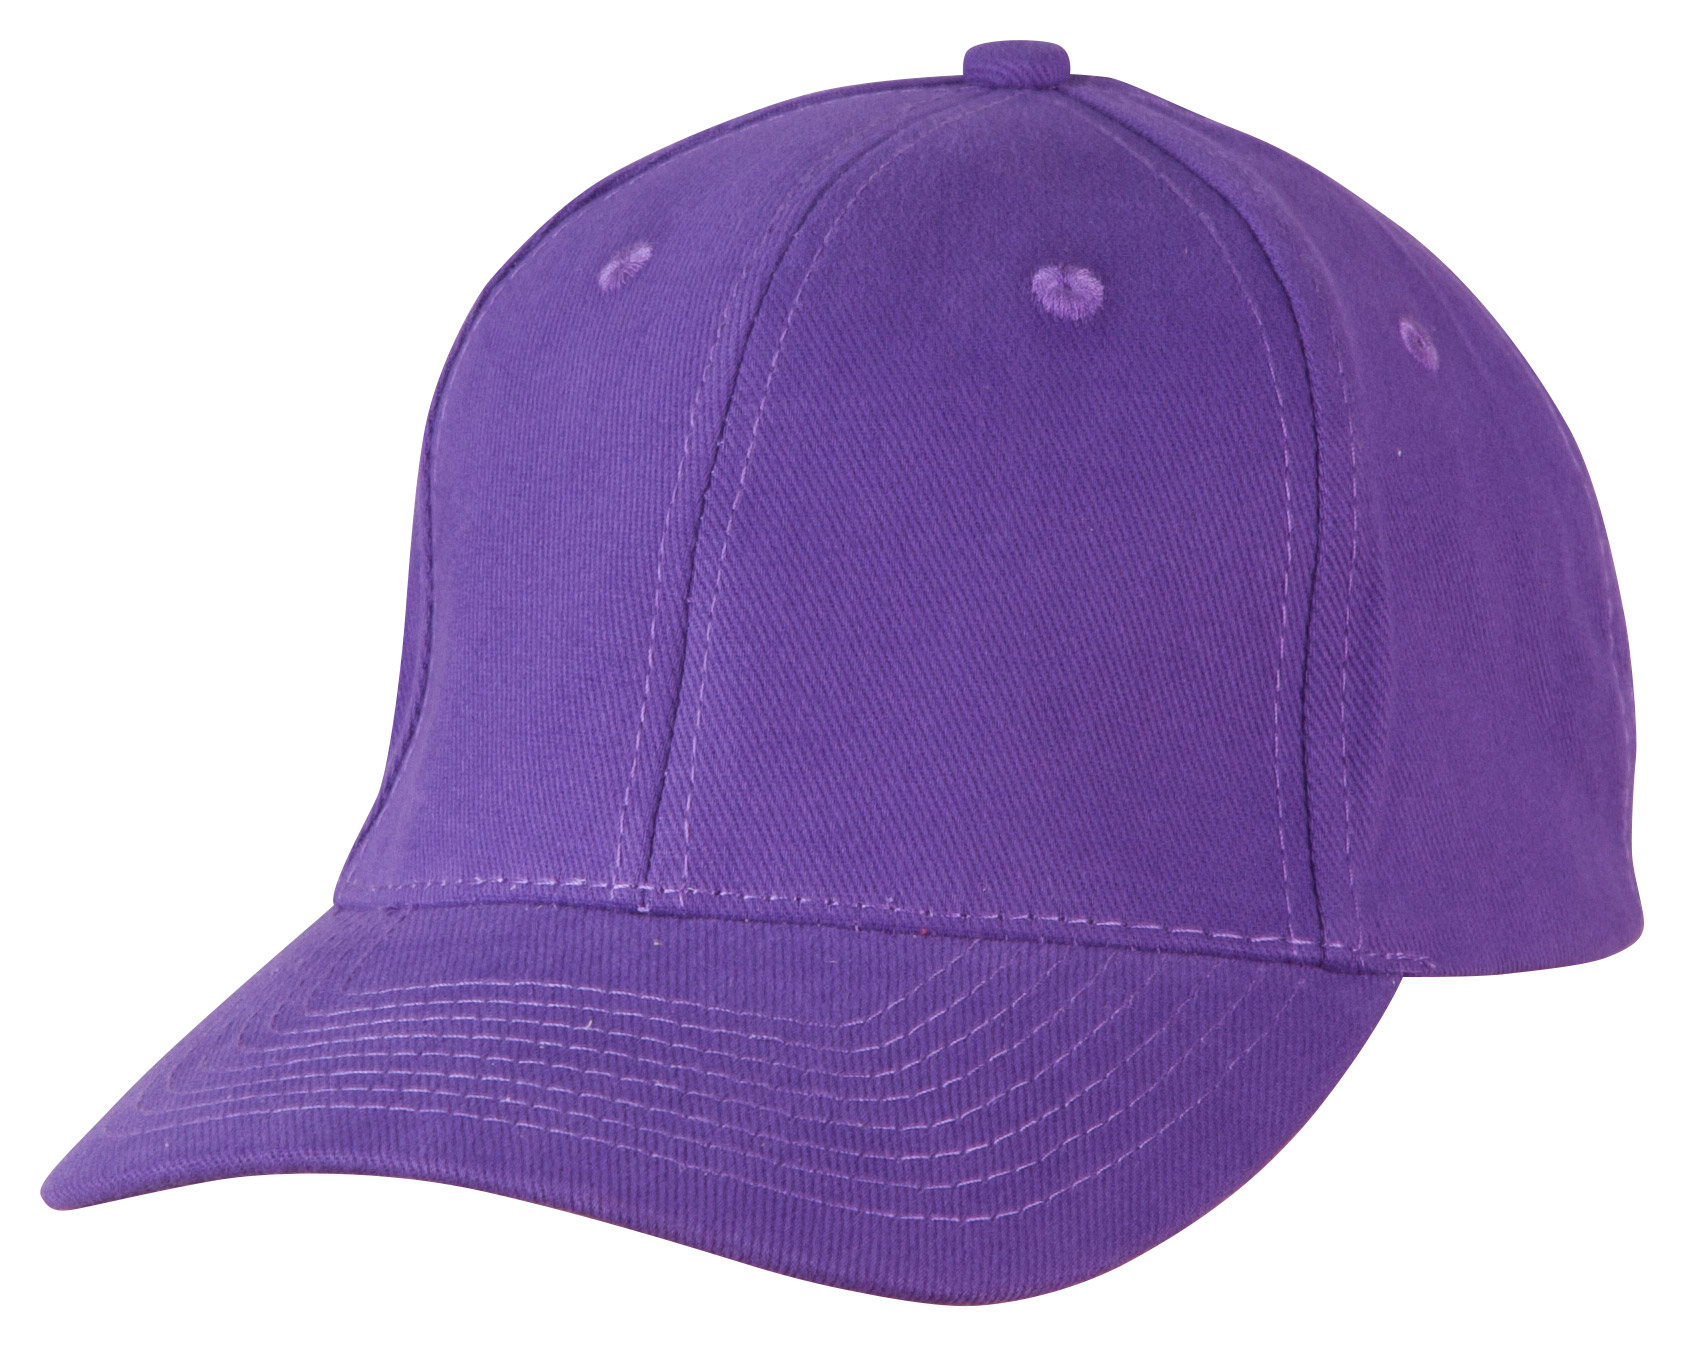 BARRIO-Structured-Baseball-Caps thumbnail 16